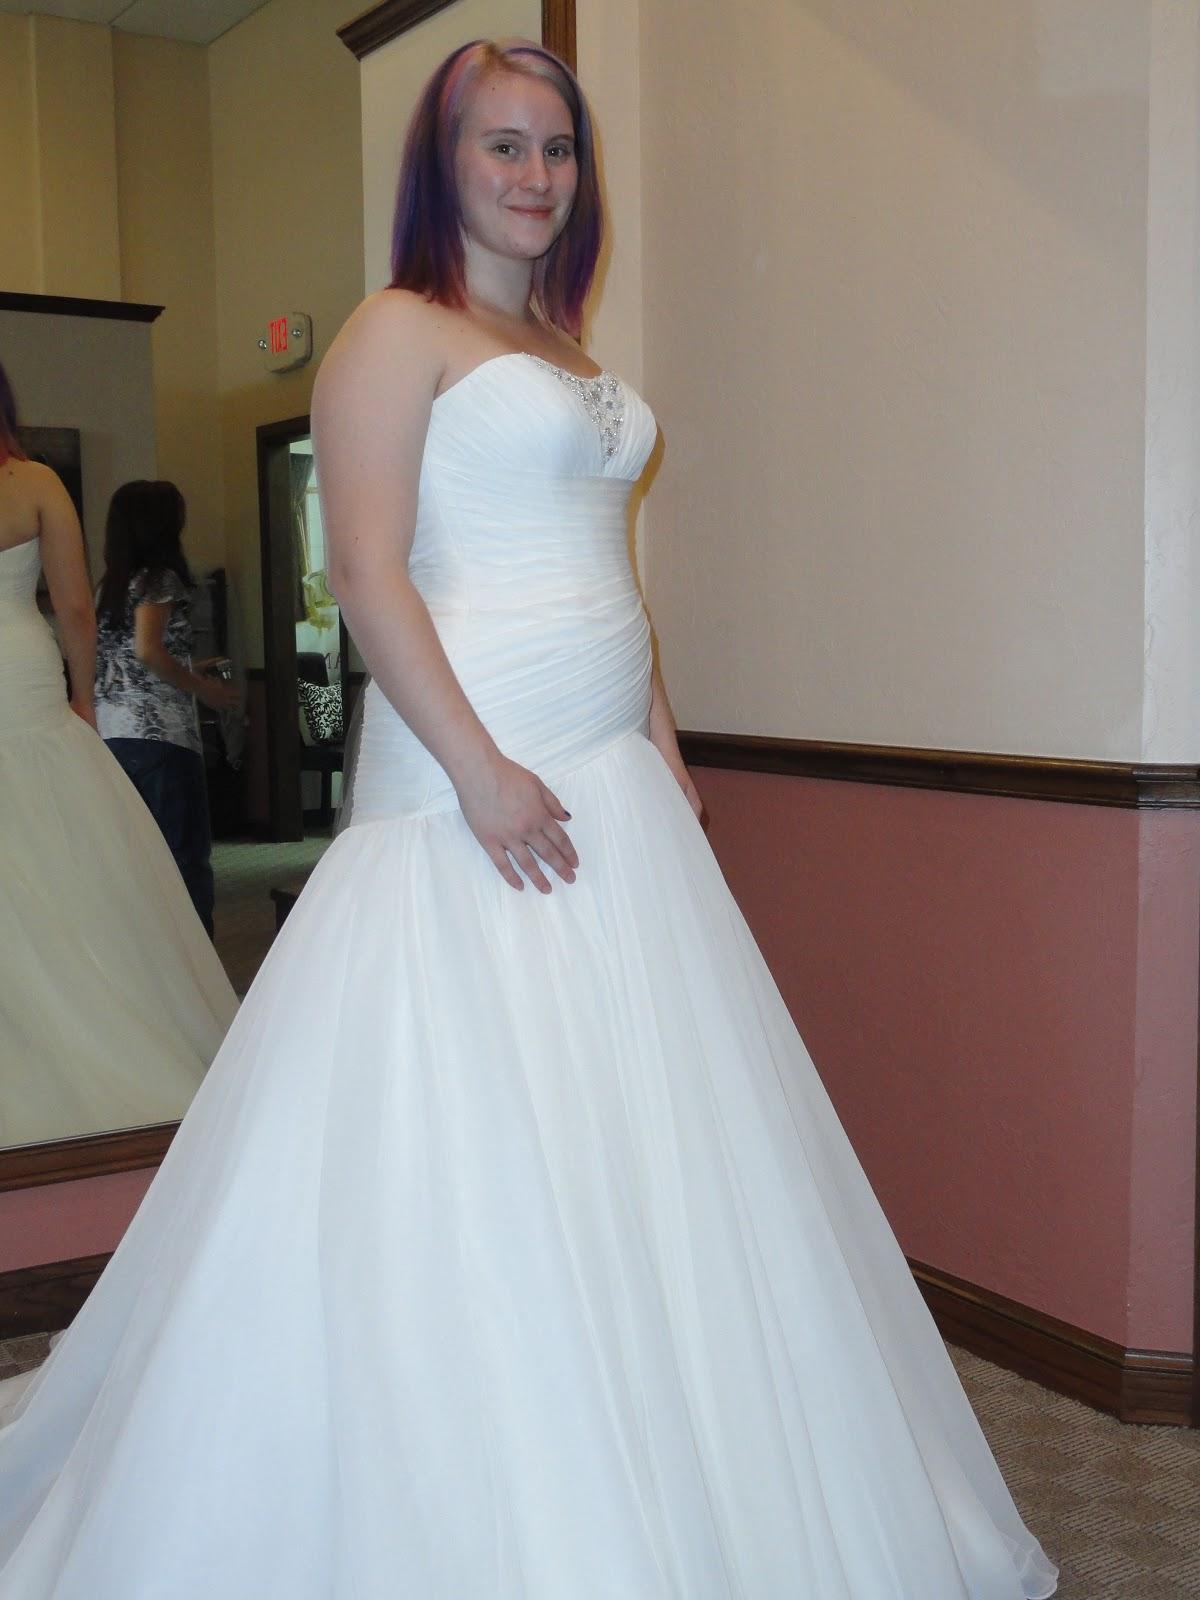 Abigail & Matthew - Newlywed!: Trying on Wedding Dresses!